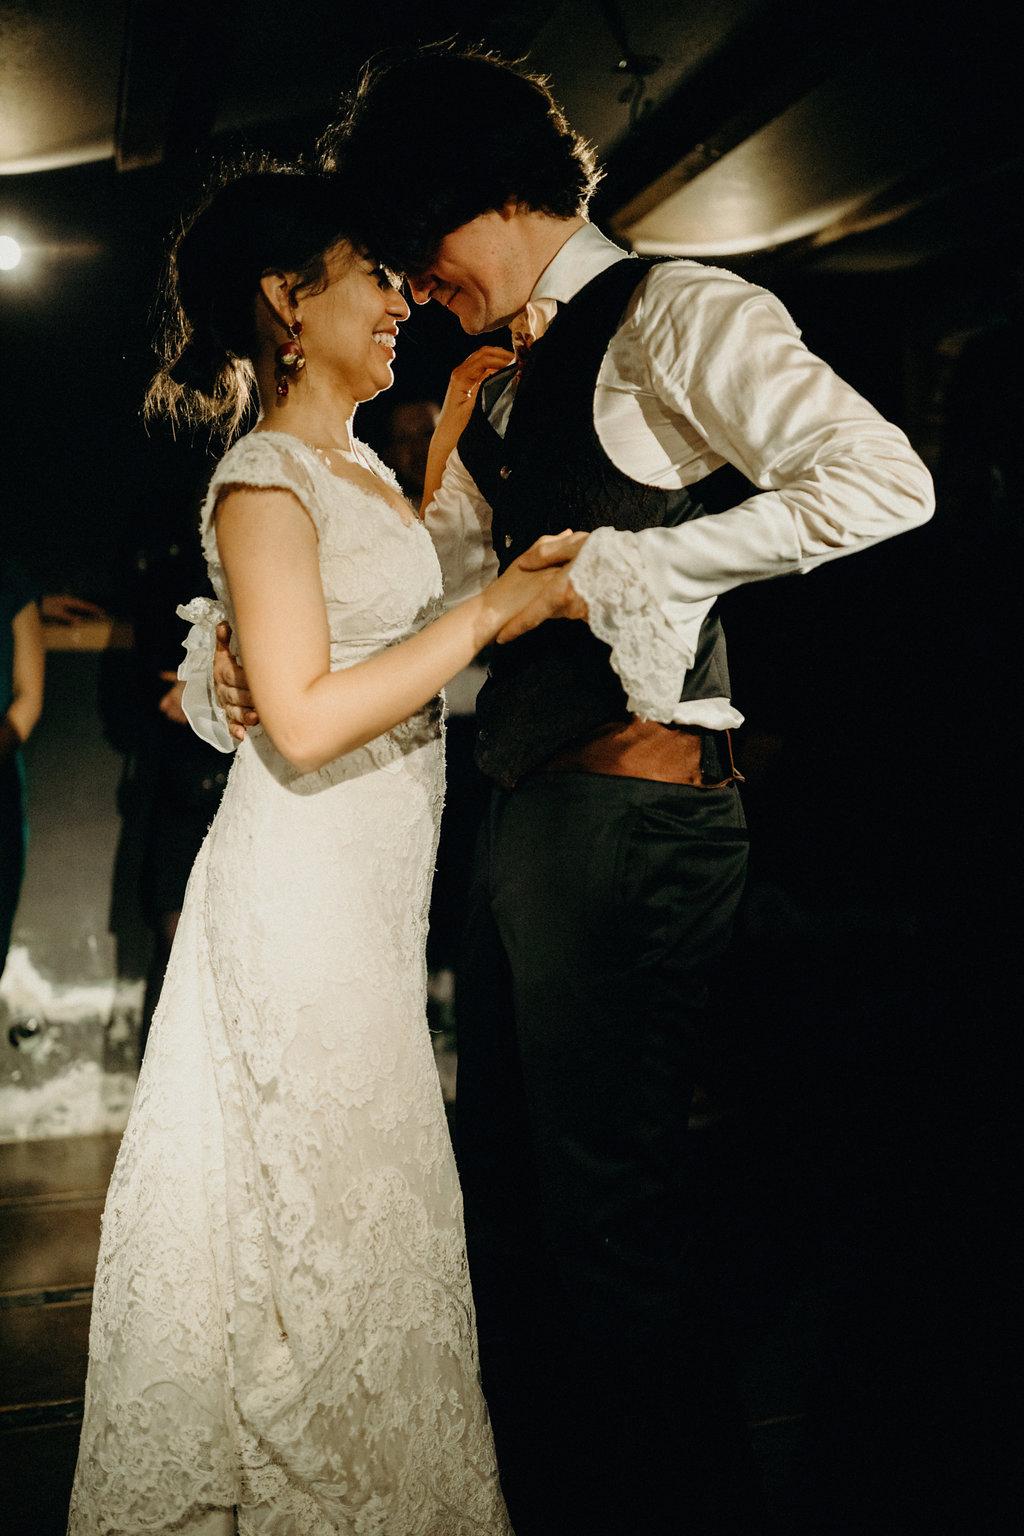 426-sjoerdbooijphotography-wedding-coen-janaina.jpg